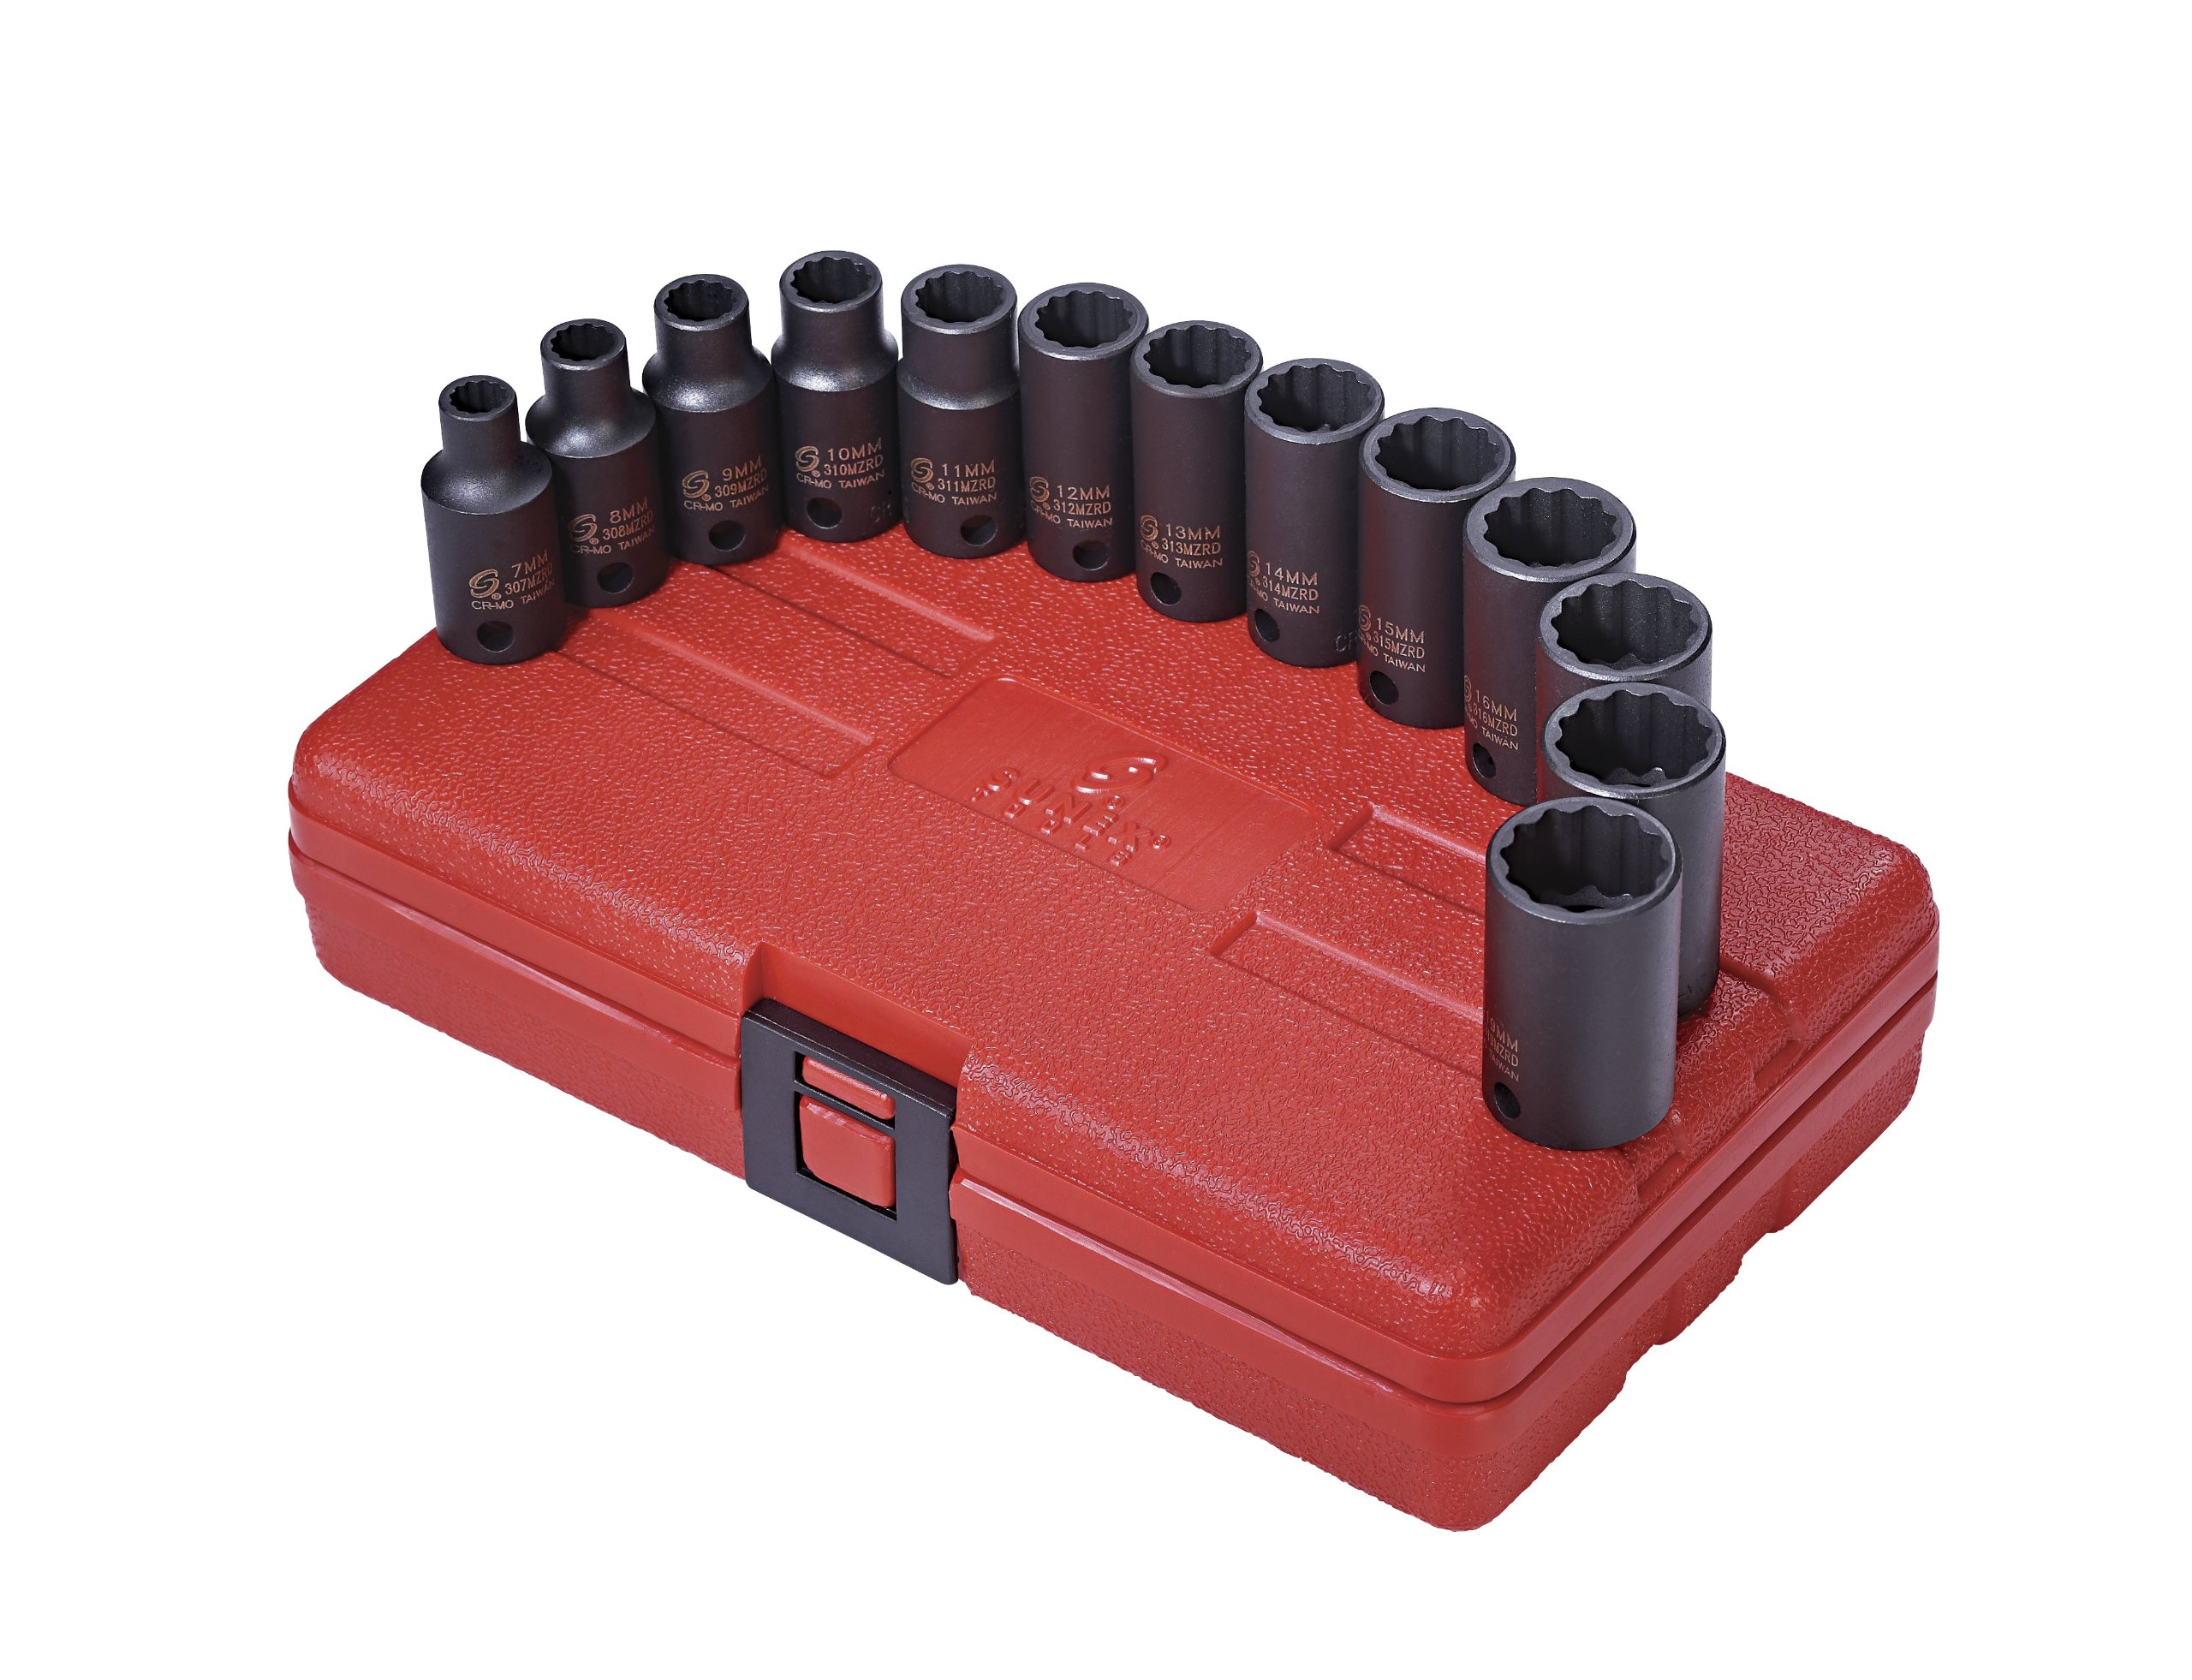 Sunex 3338 3/8-Inch Drive 12 Point Metric Semi-Deep Impact Socket Set, 13-Piece